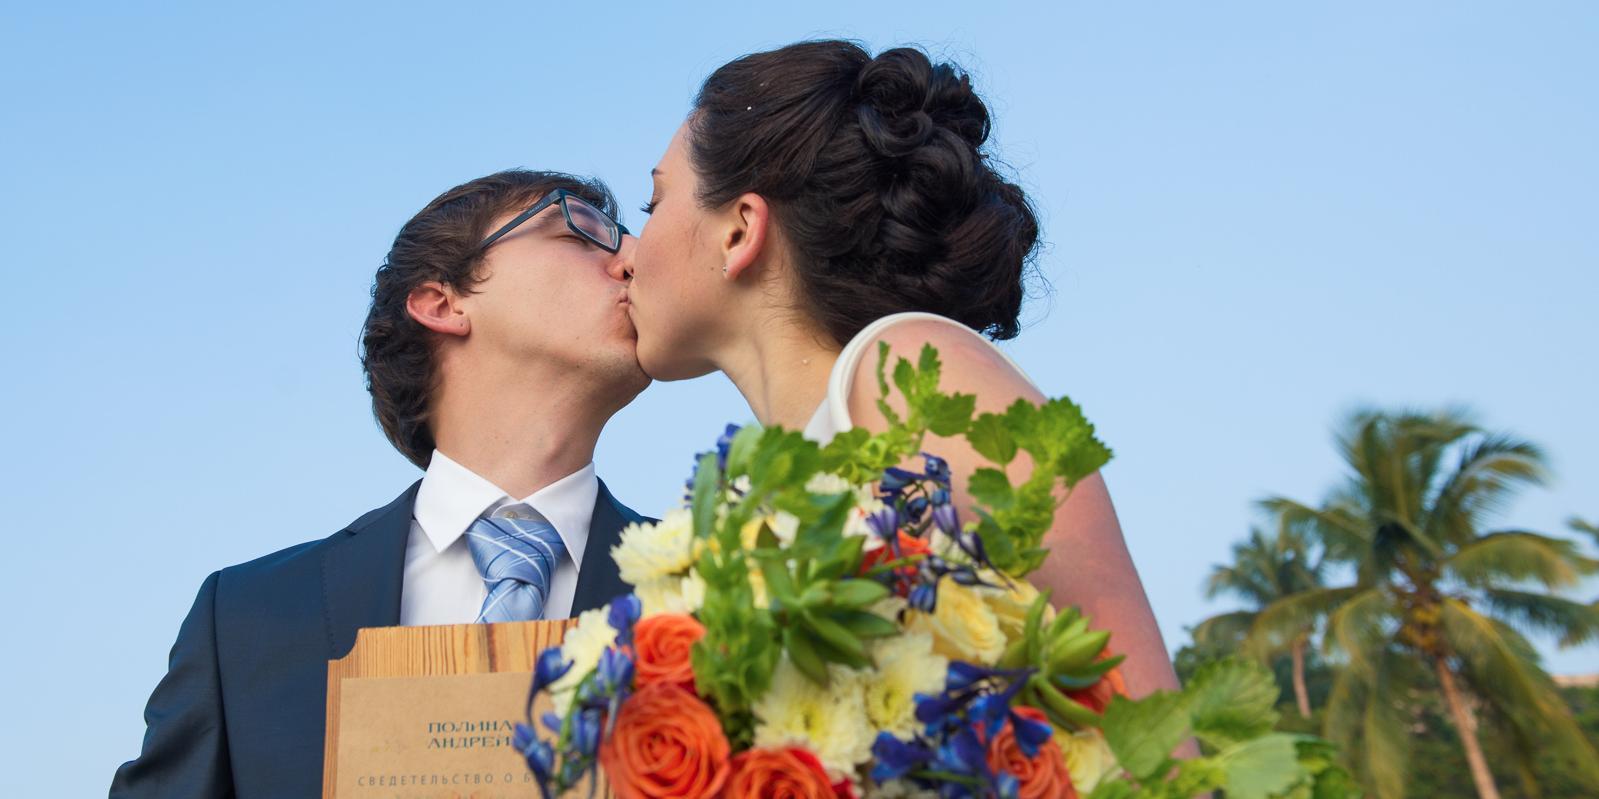 bodas-vintage-sin-tema-cuba-7111.jpg